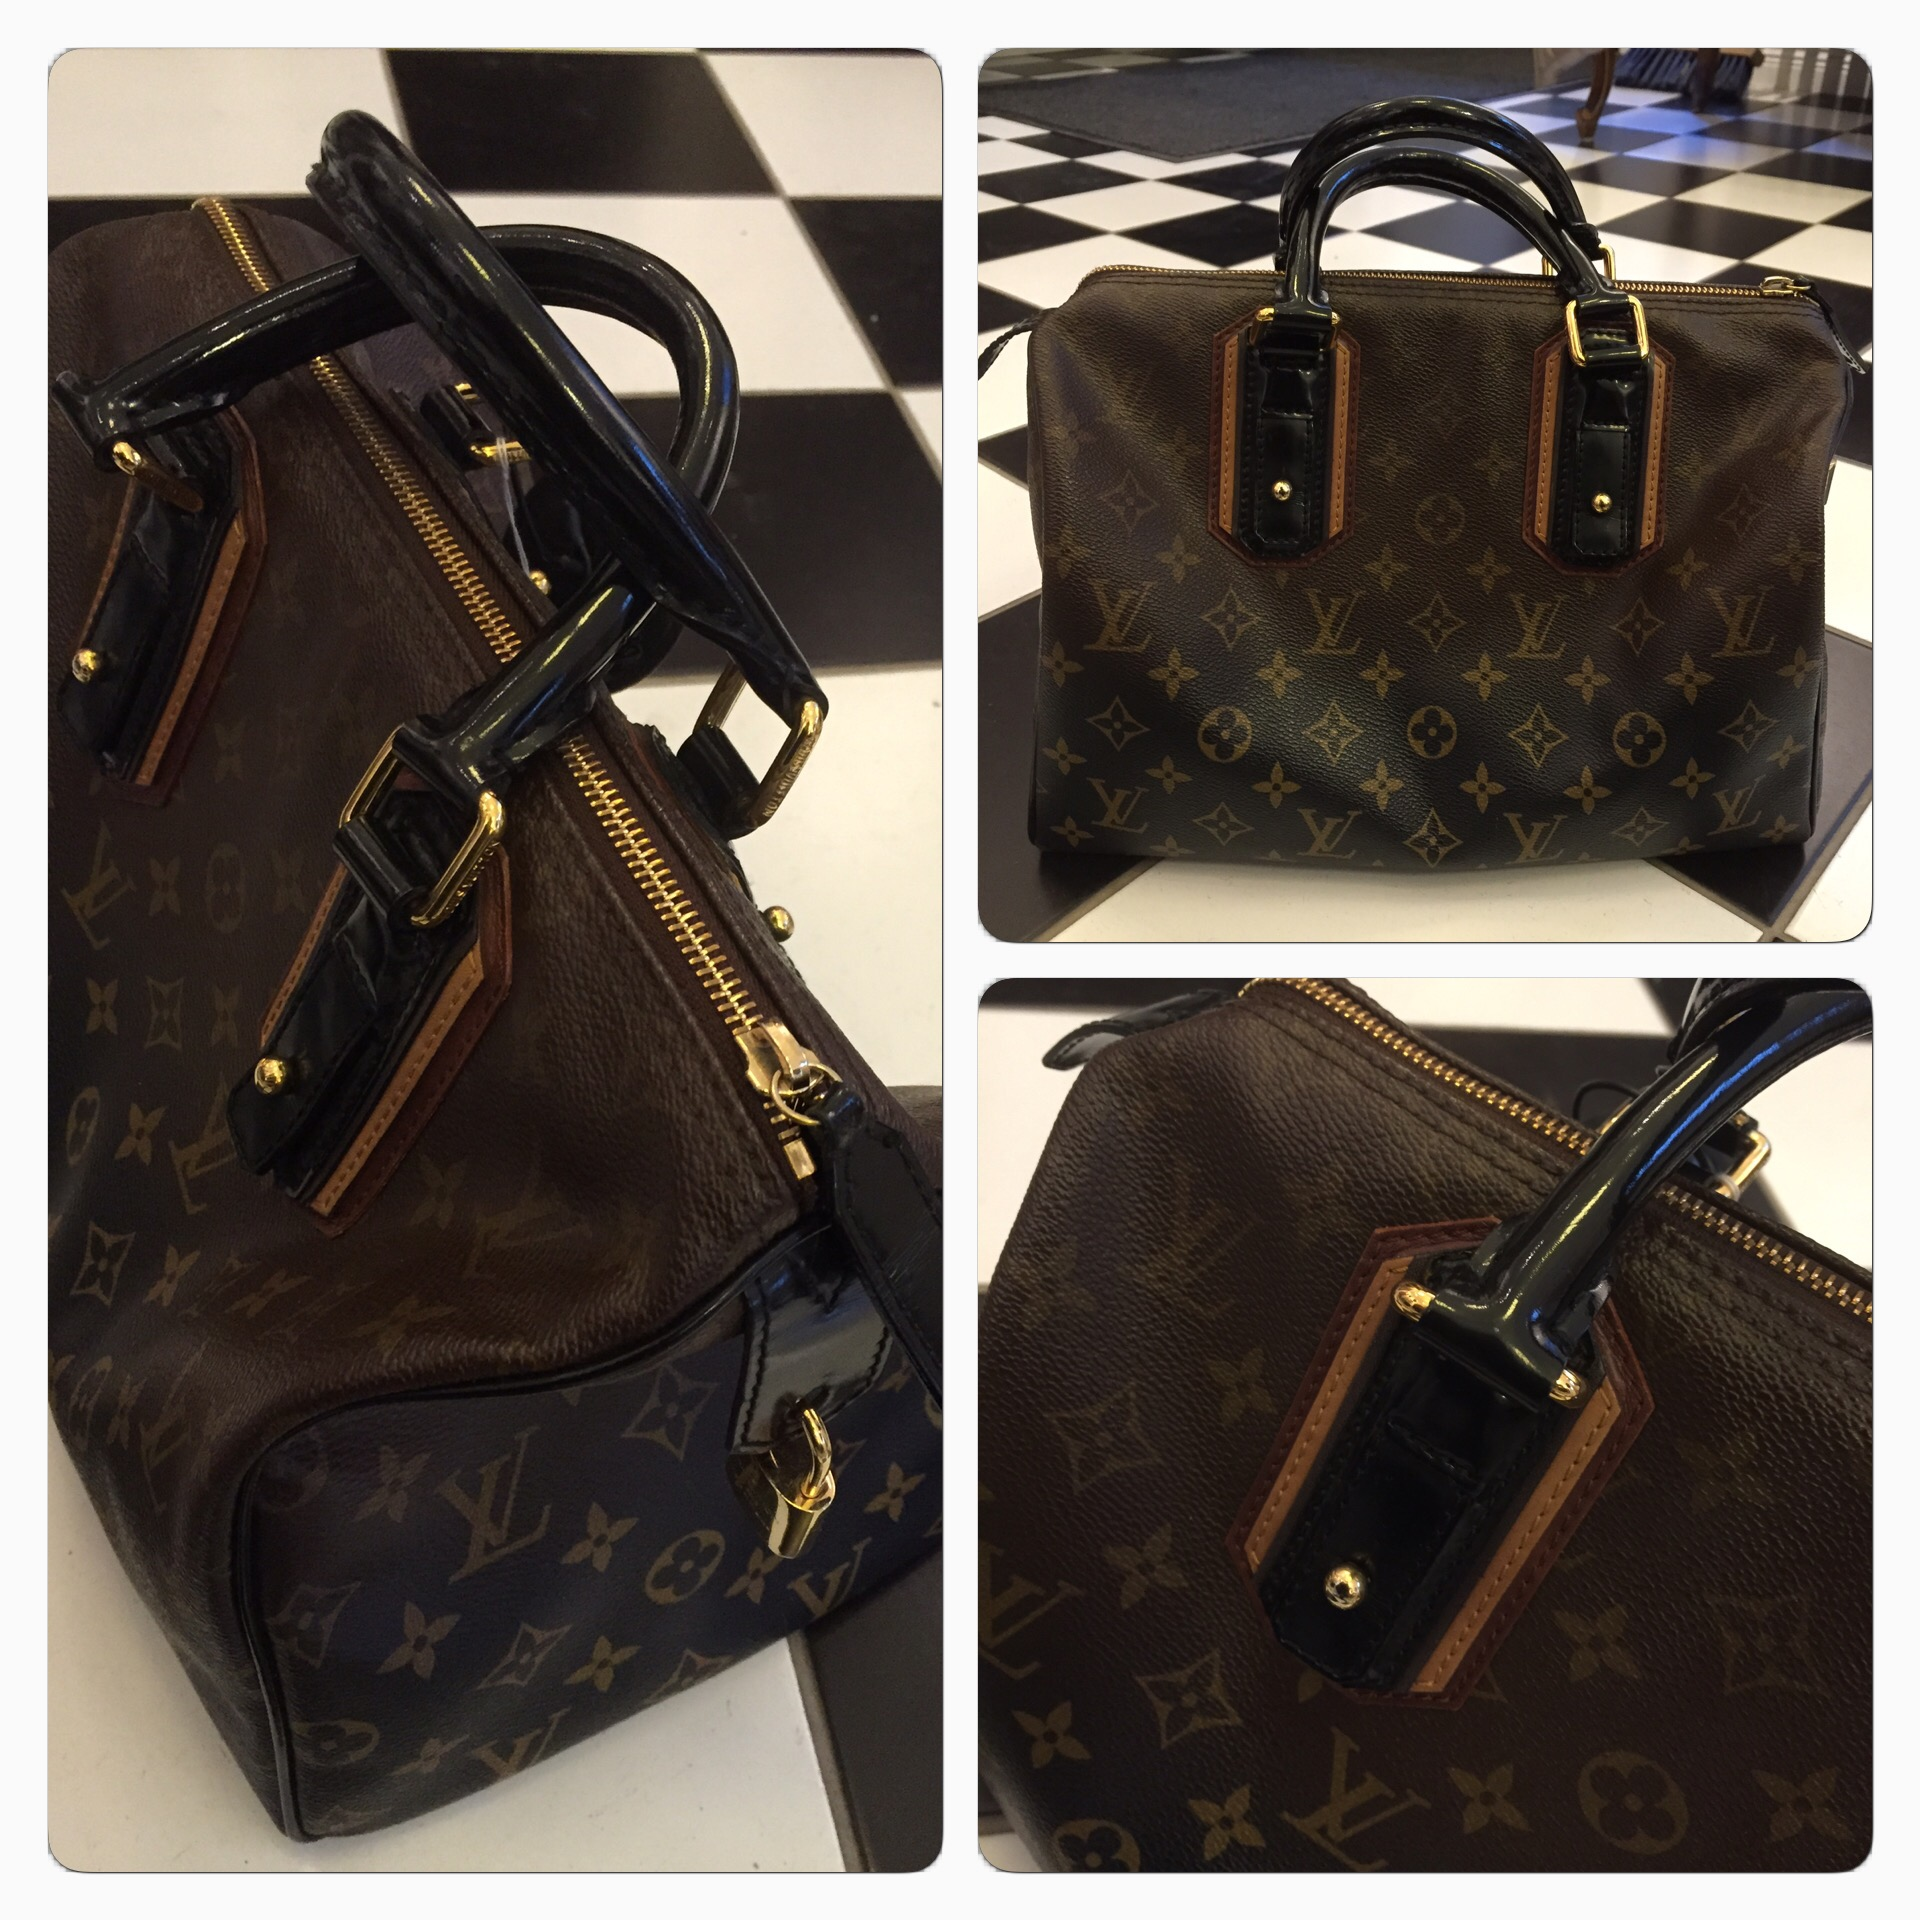 Limited Edition Louis Vuitton Speedy Väska